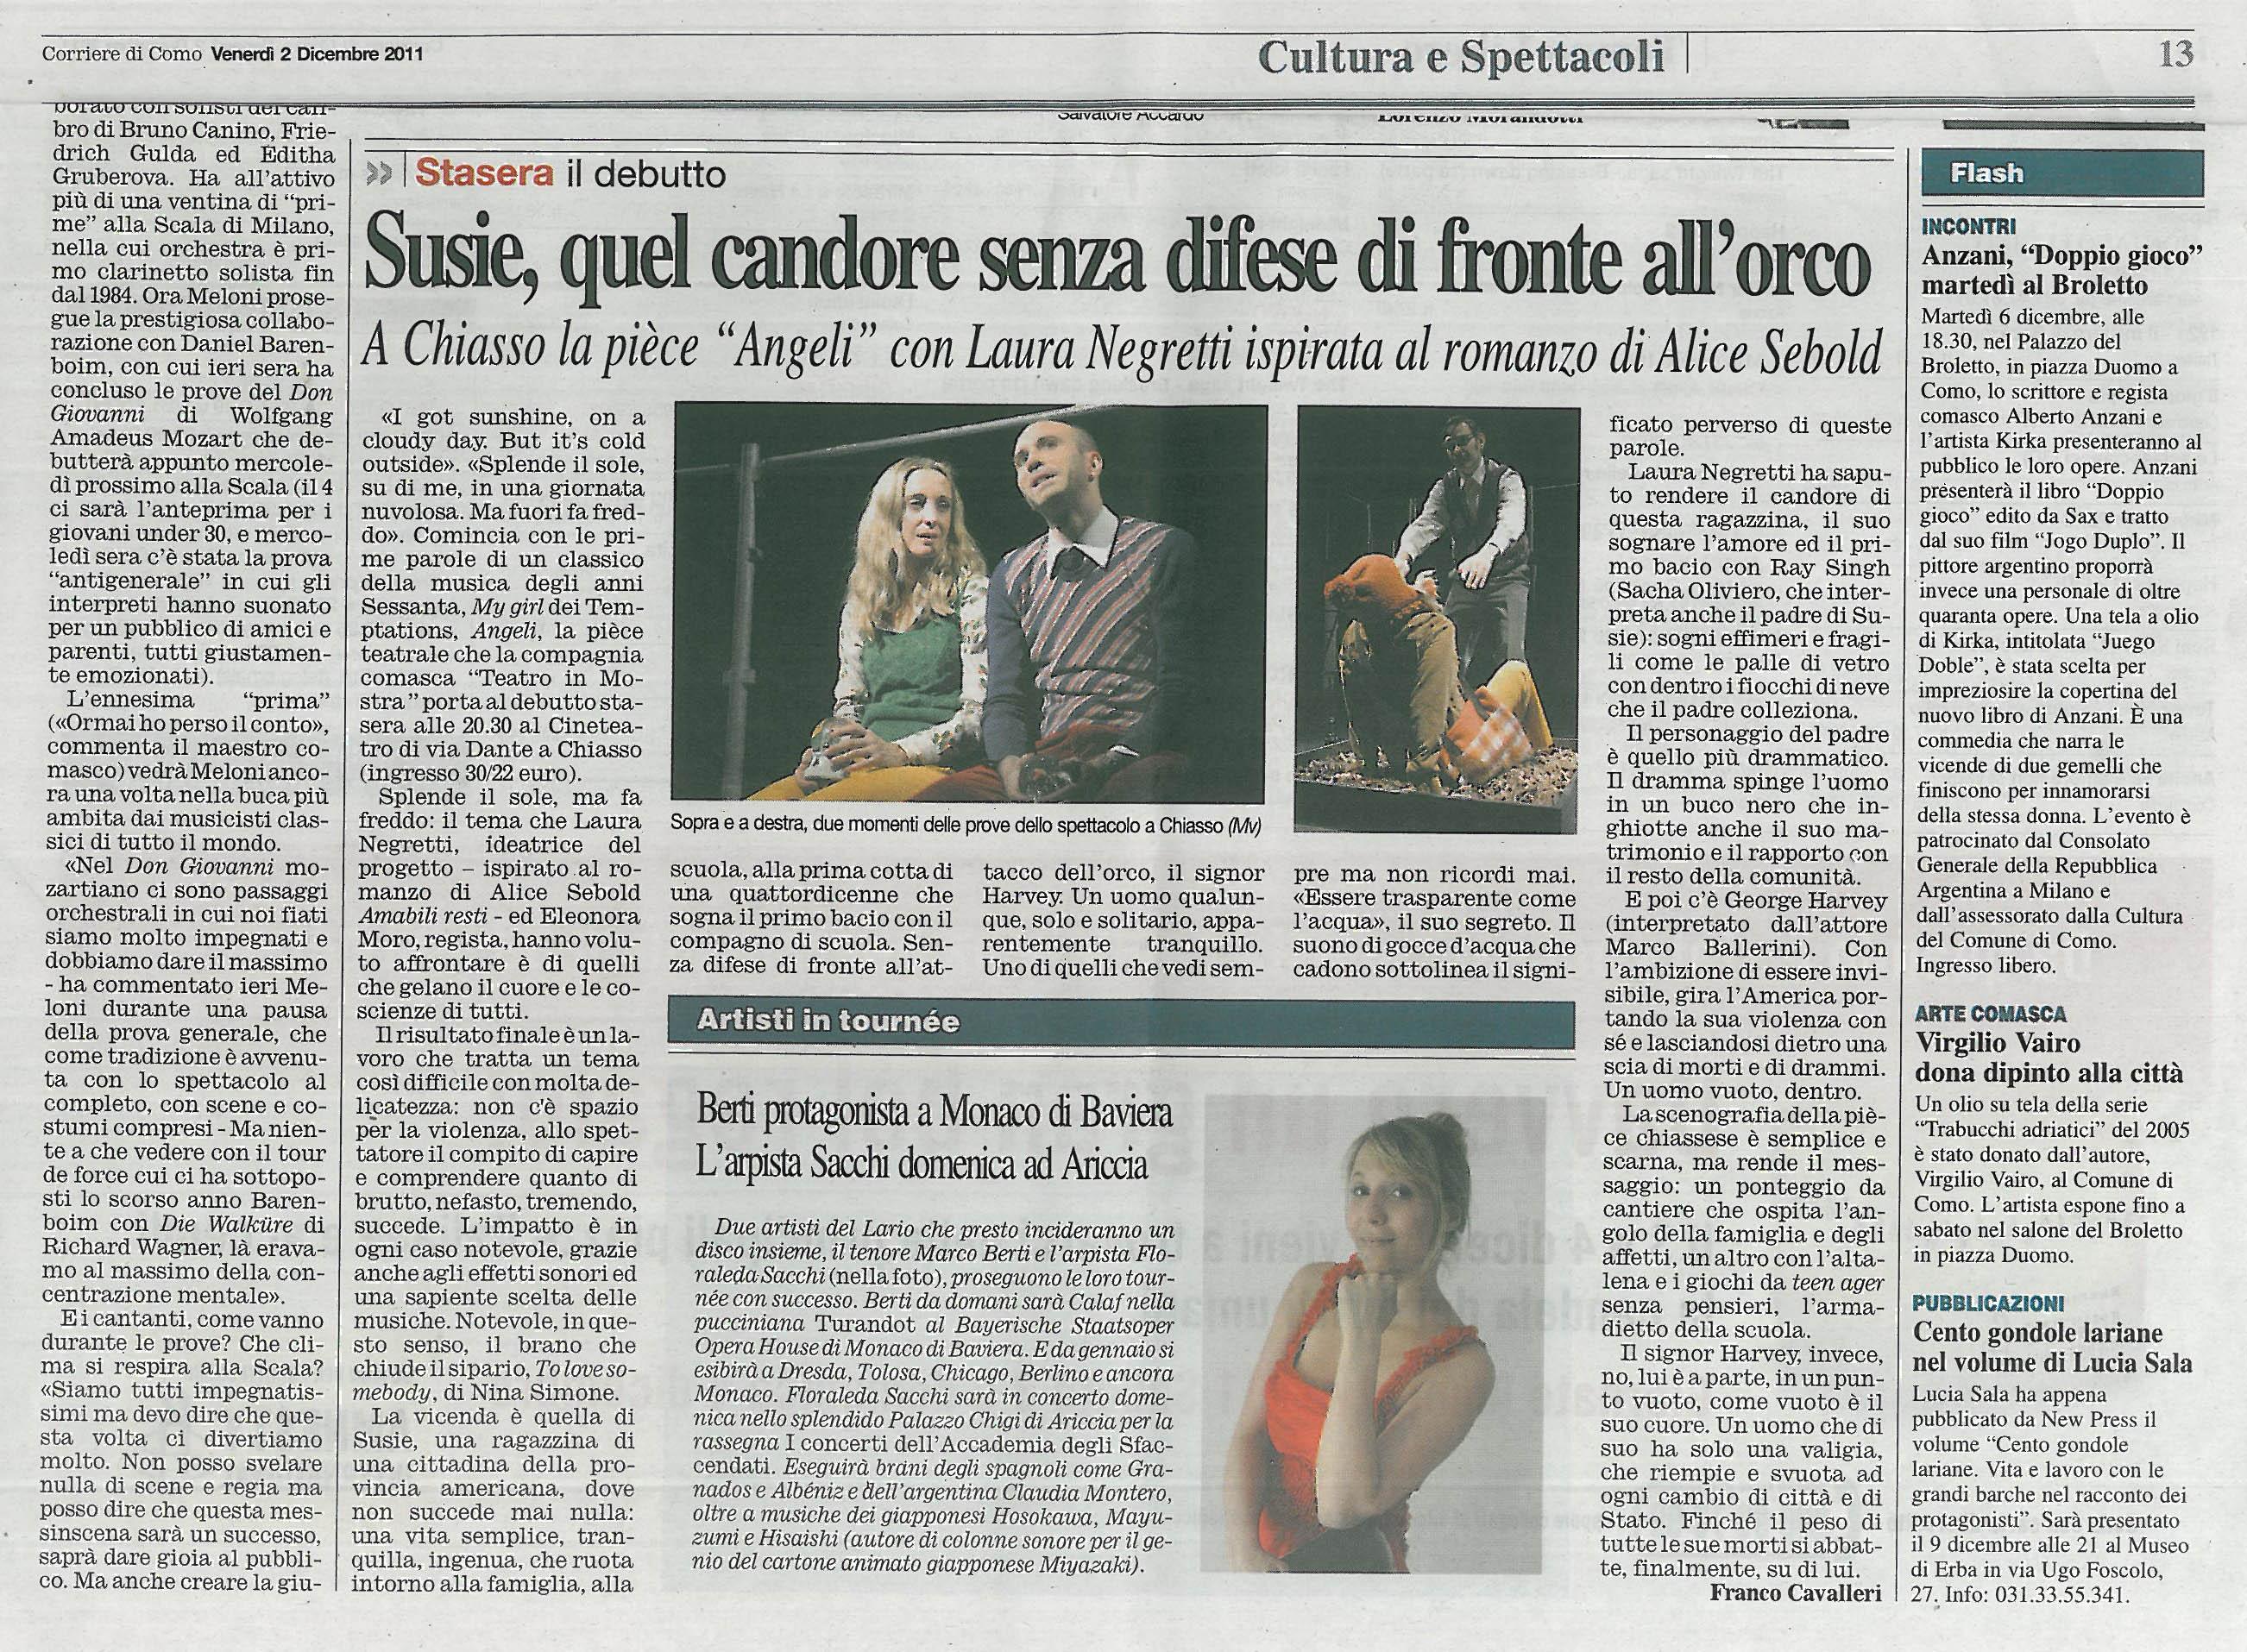 RECENSIONE Corriere Como 2 Dicembre 2011